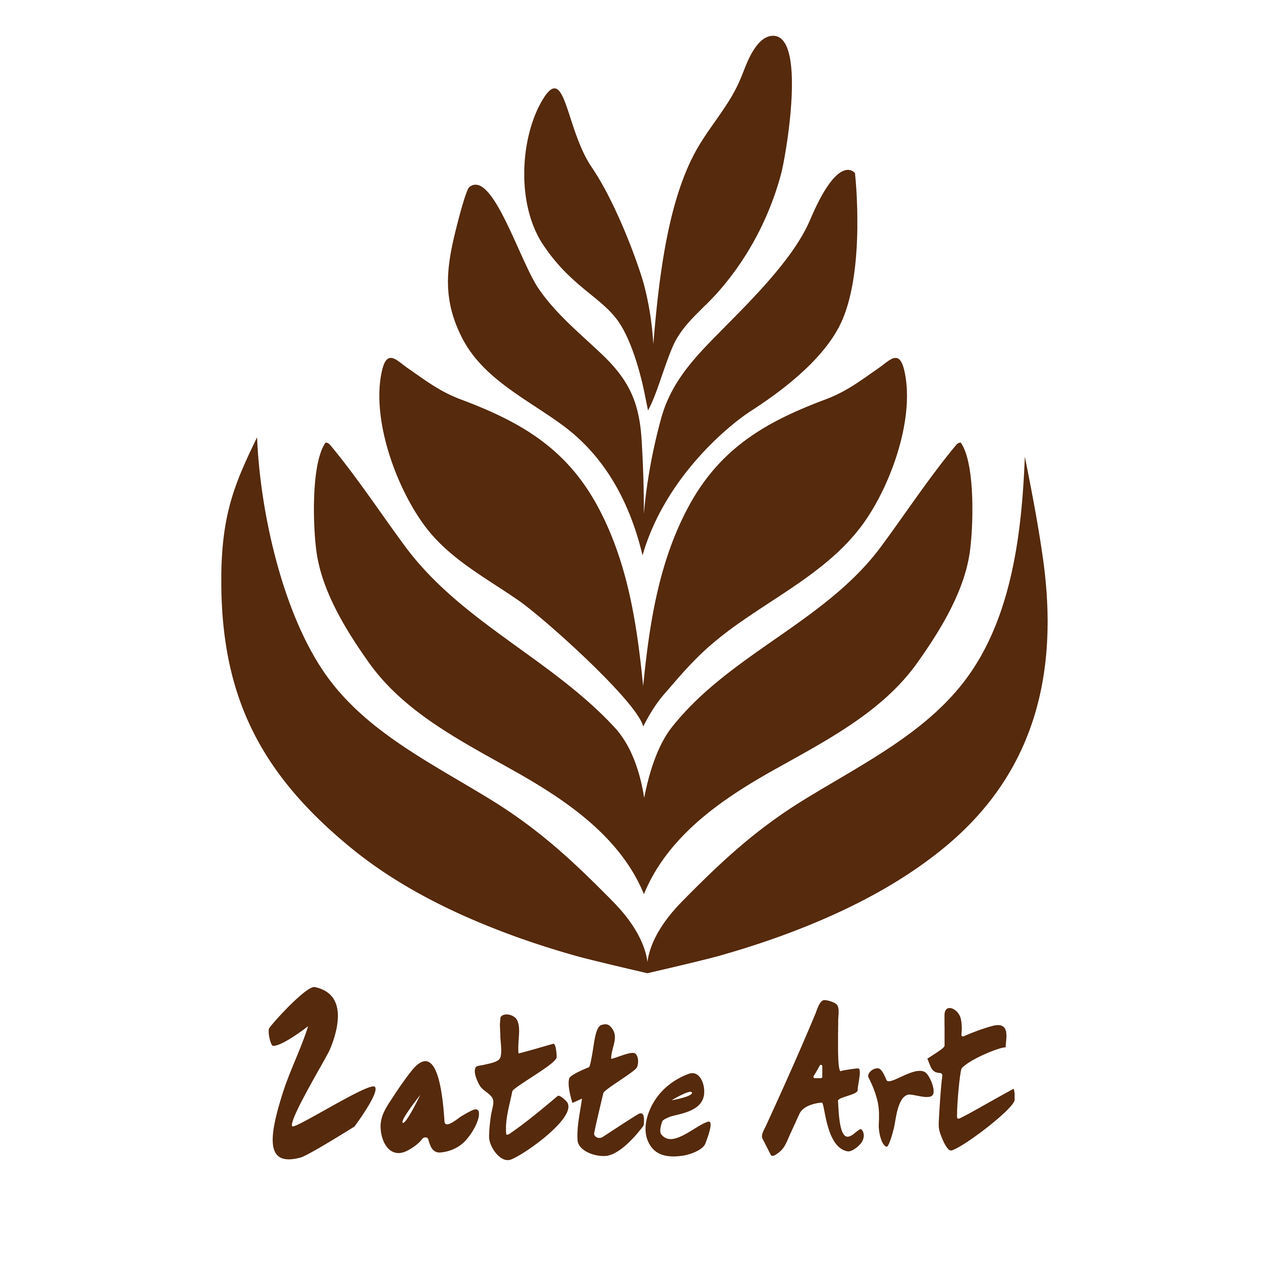 Latte Art Coffee Logo Icon Symbol Design America Art Beige Beverage Cafe Caffeine Caramel Chocolate Cinamon Coffee Cream Cute Design Dessert Freshness From My Point Of View Froth Italian Latte Milk Shop Smooth Tasting